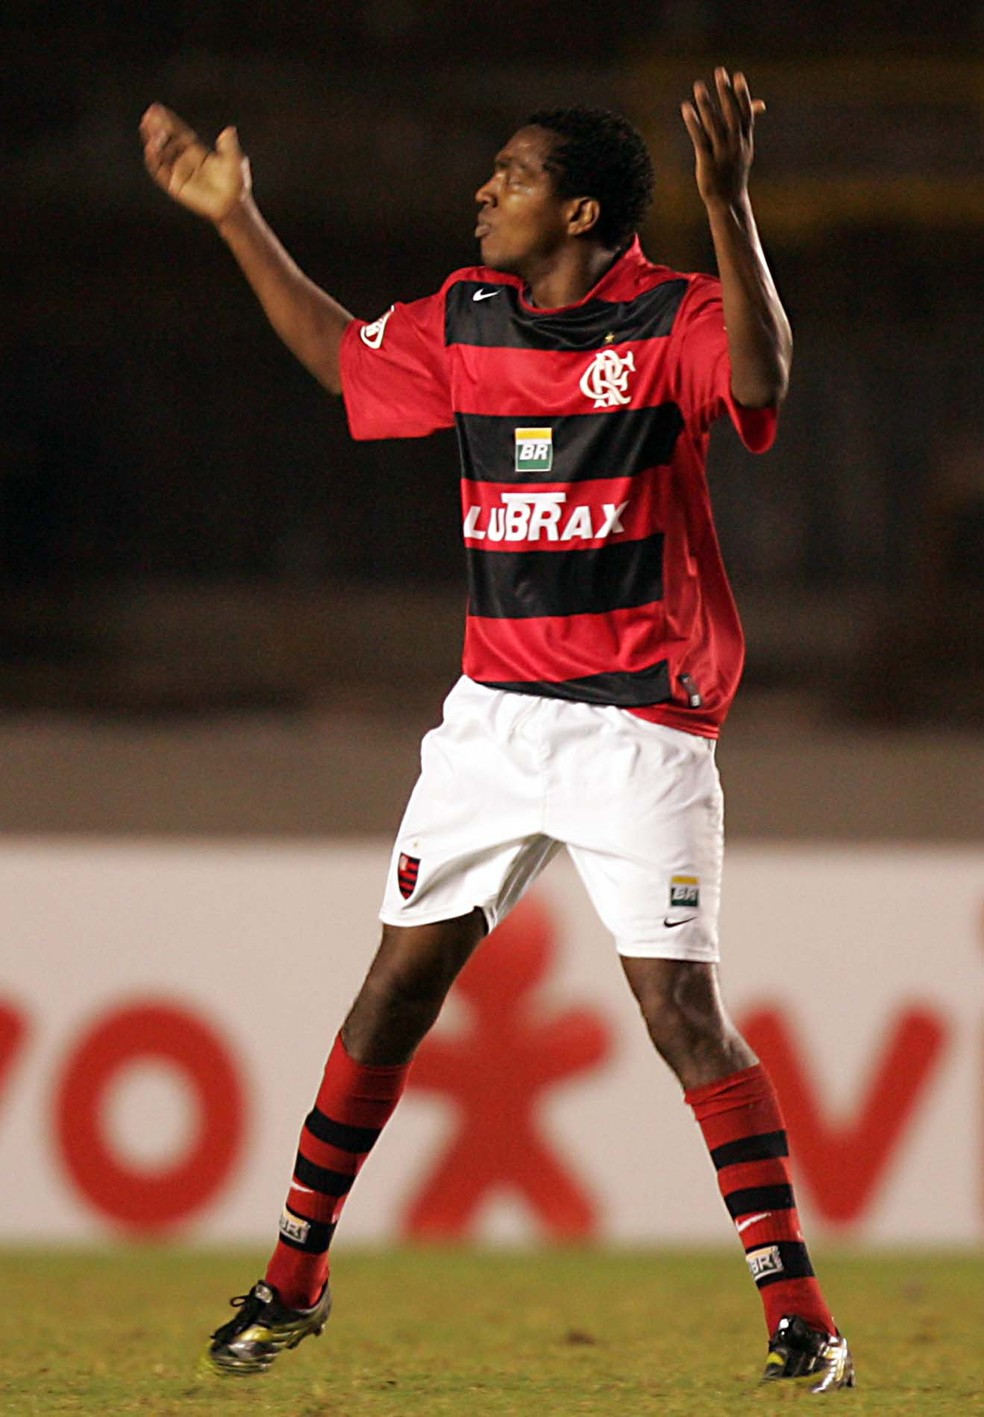 Renato Abreu foi o principal jogador no título da Copa do Brasil de 2006 — Foto: Agência Estado